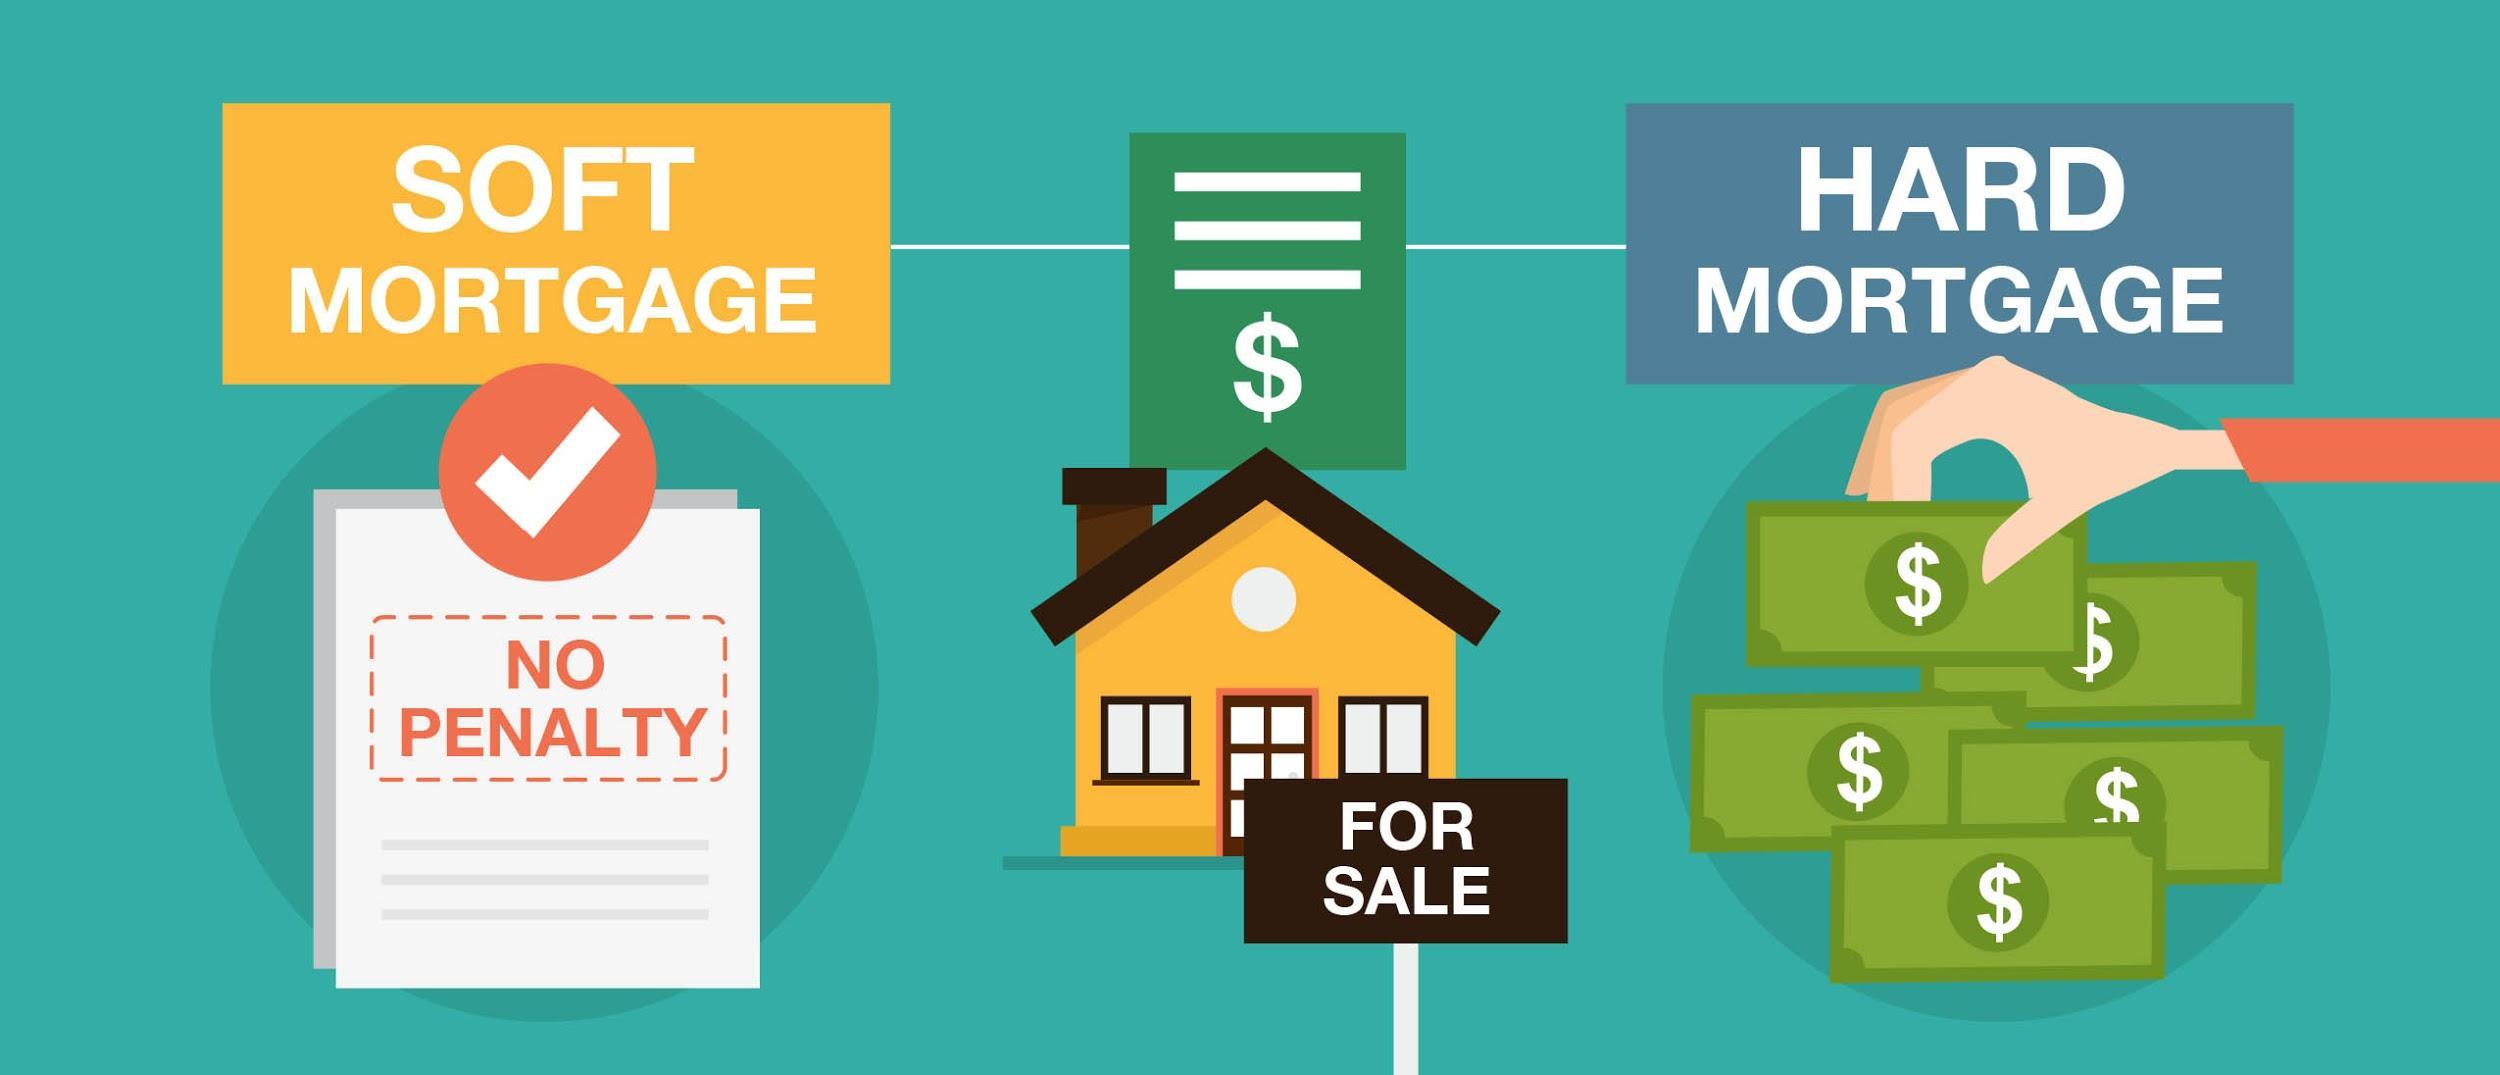 Soft mortgage vs hard mortgage illustration